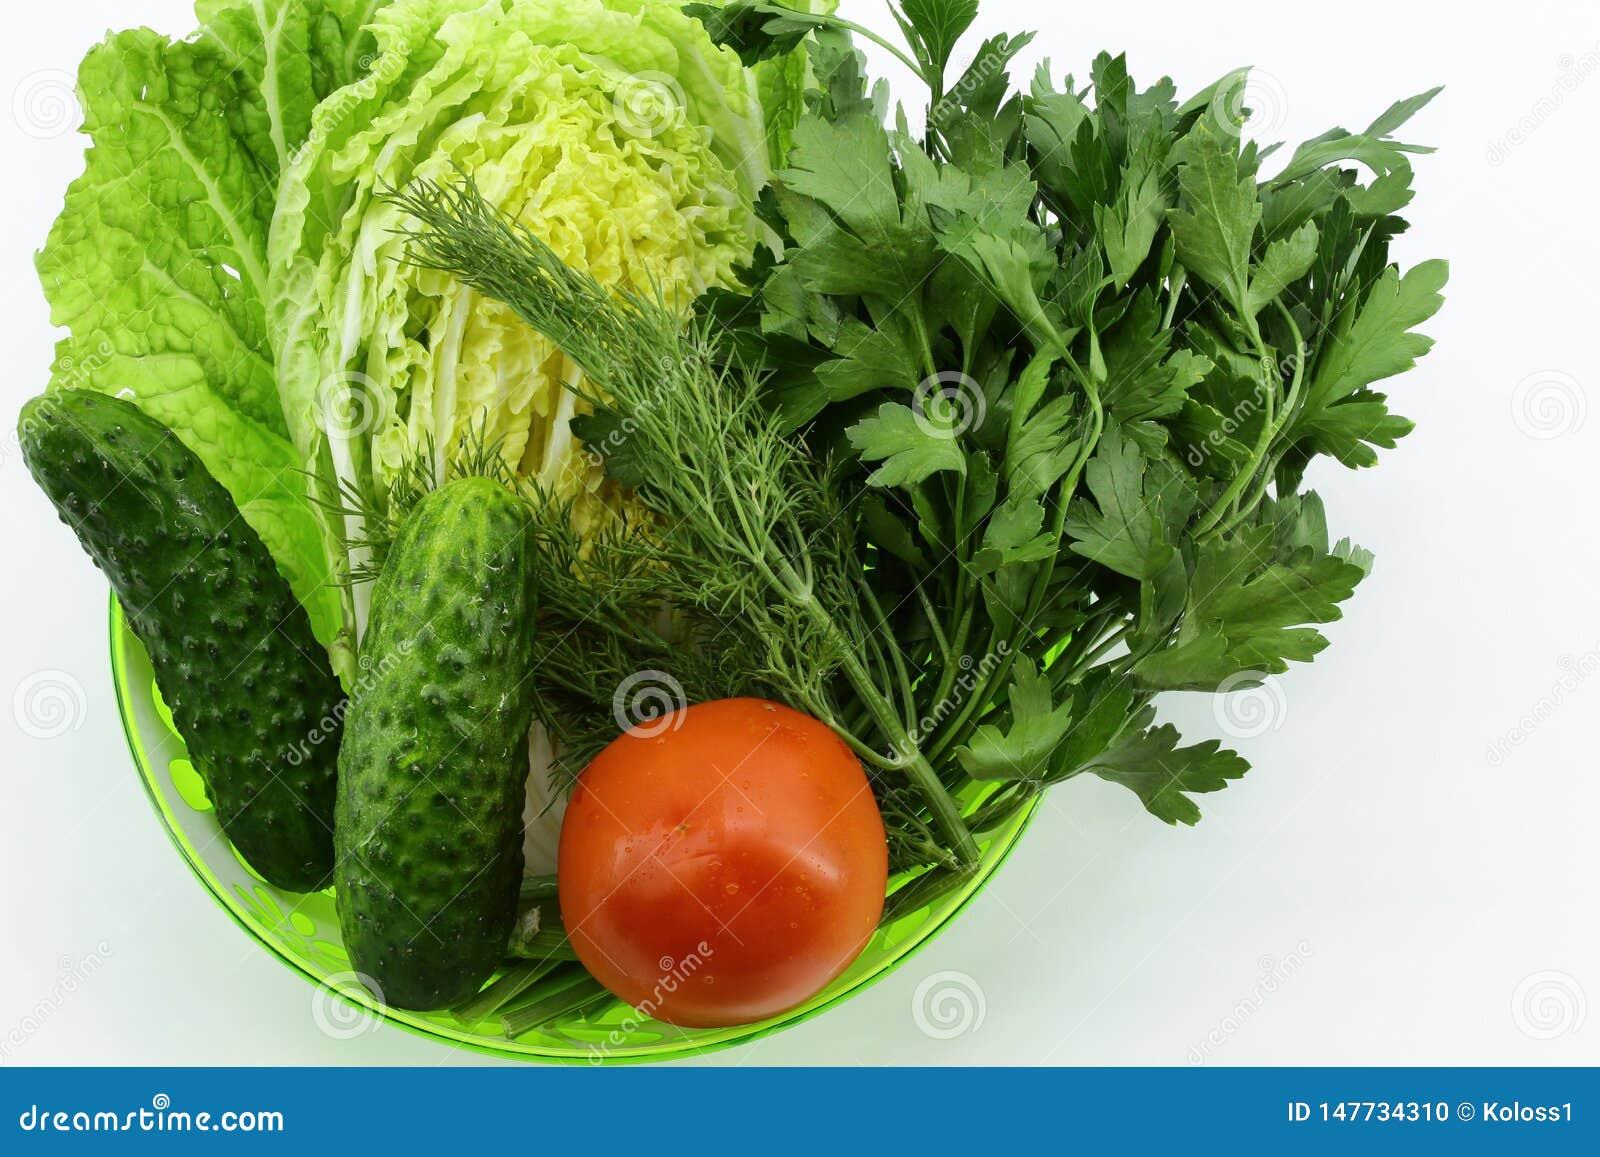 Vegetable set in deep green bowl on light background